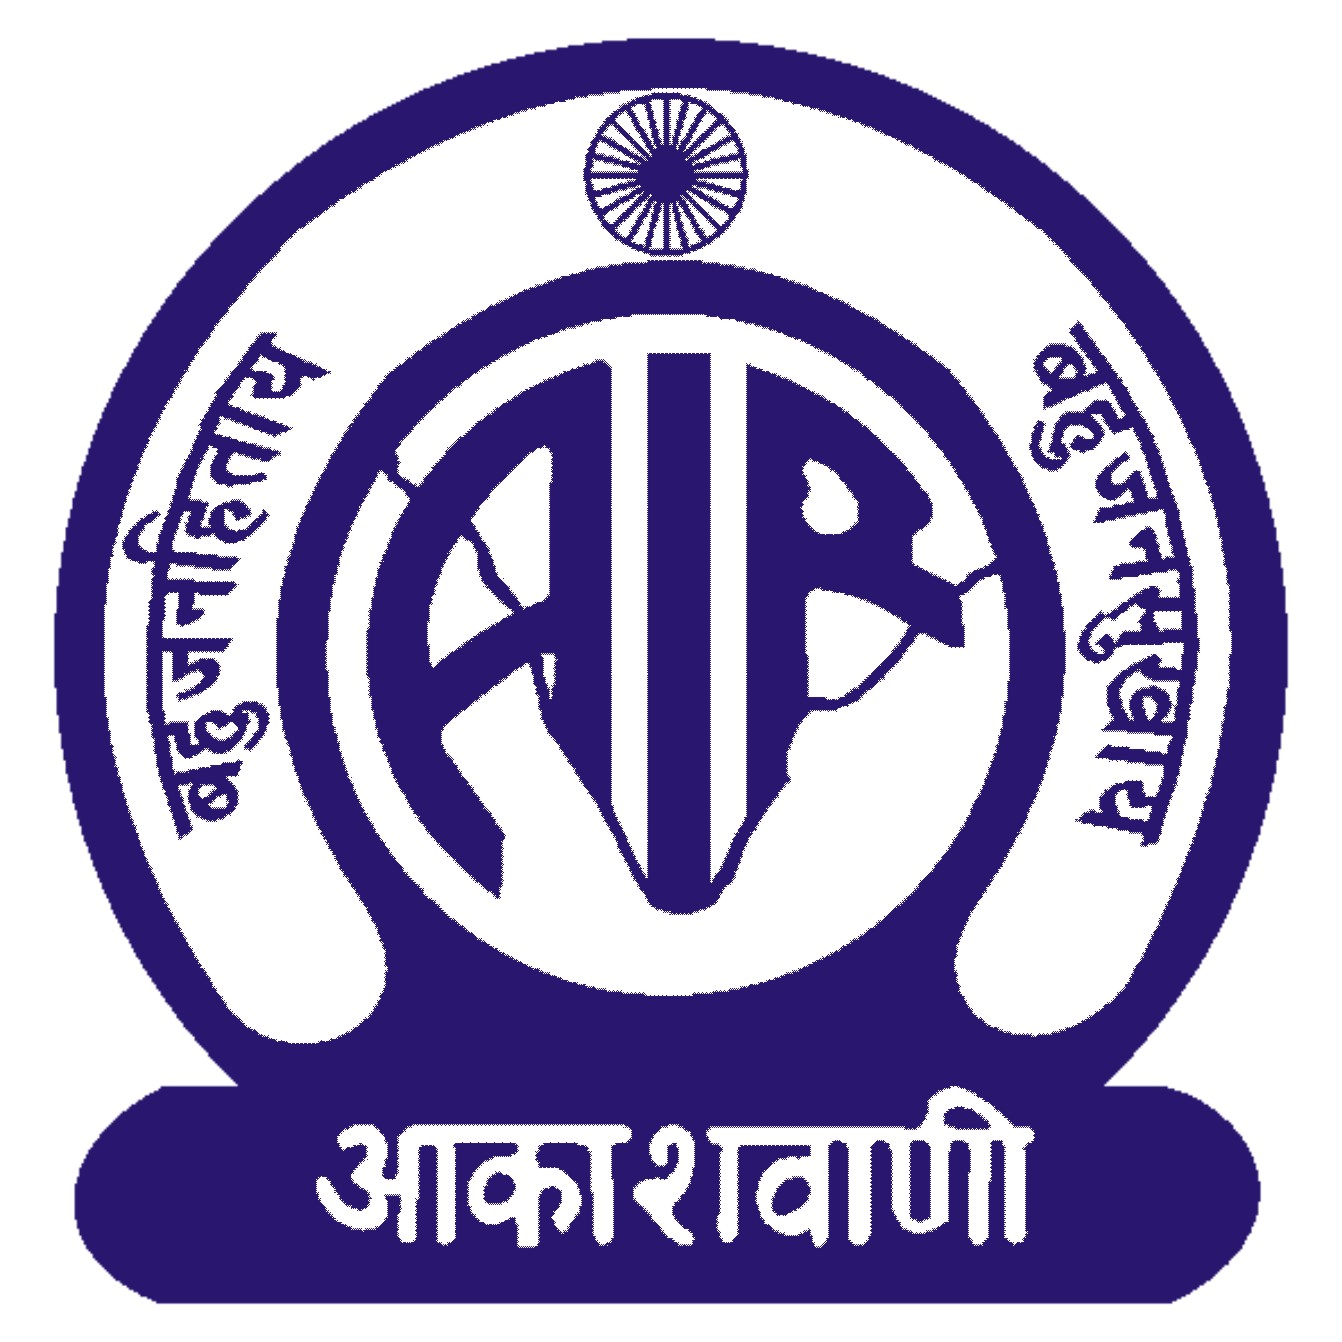 All India Radio app